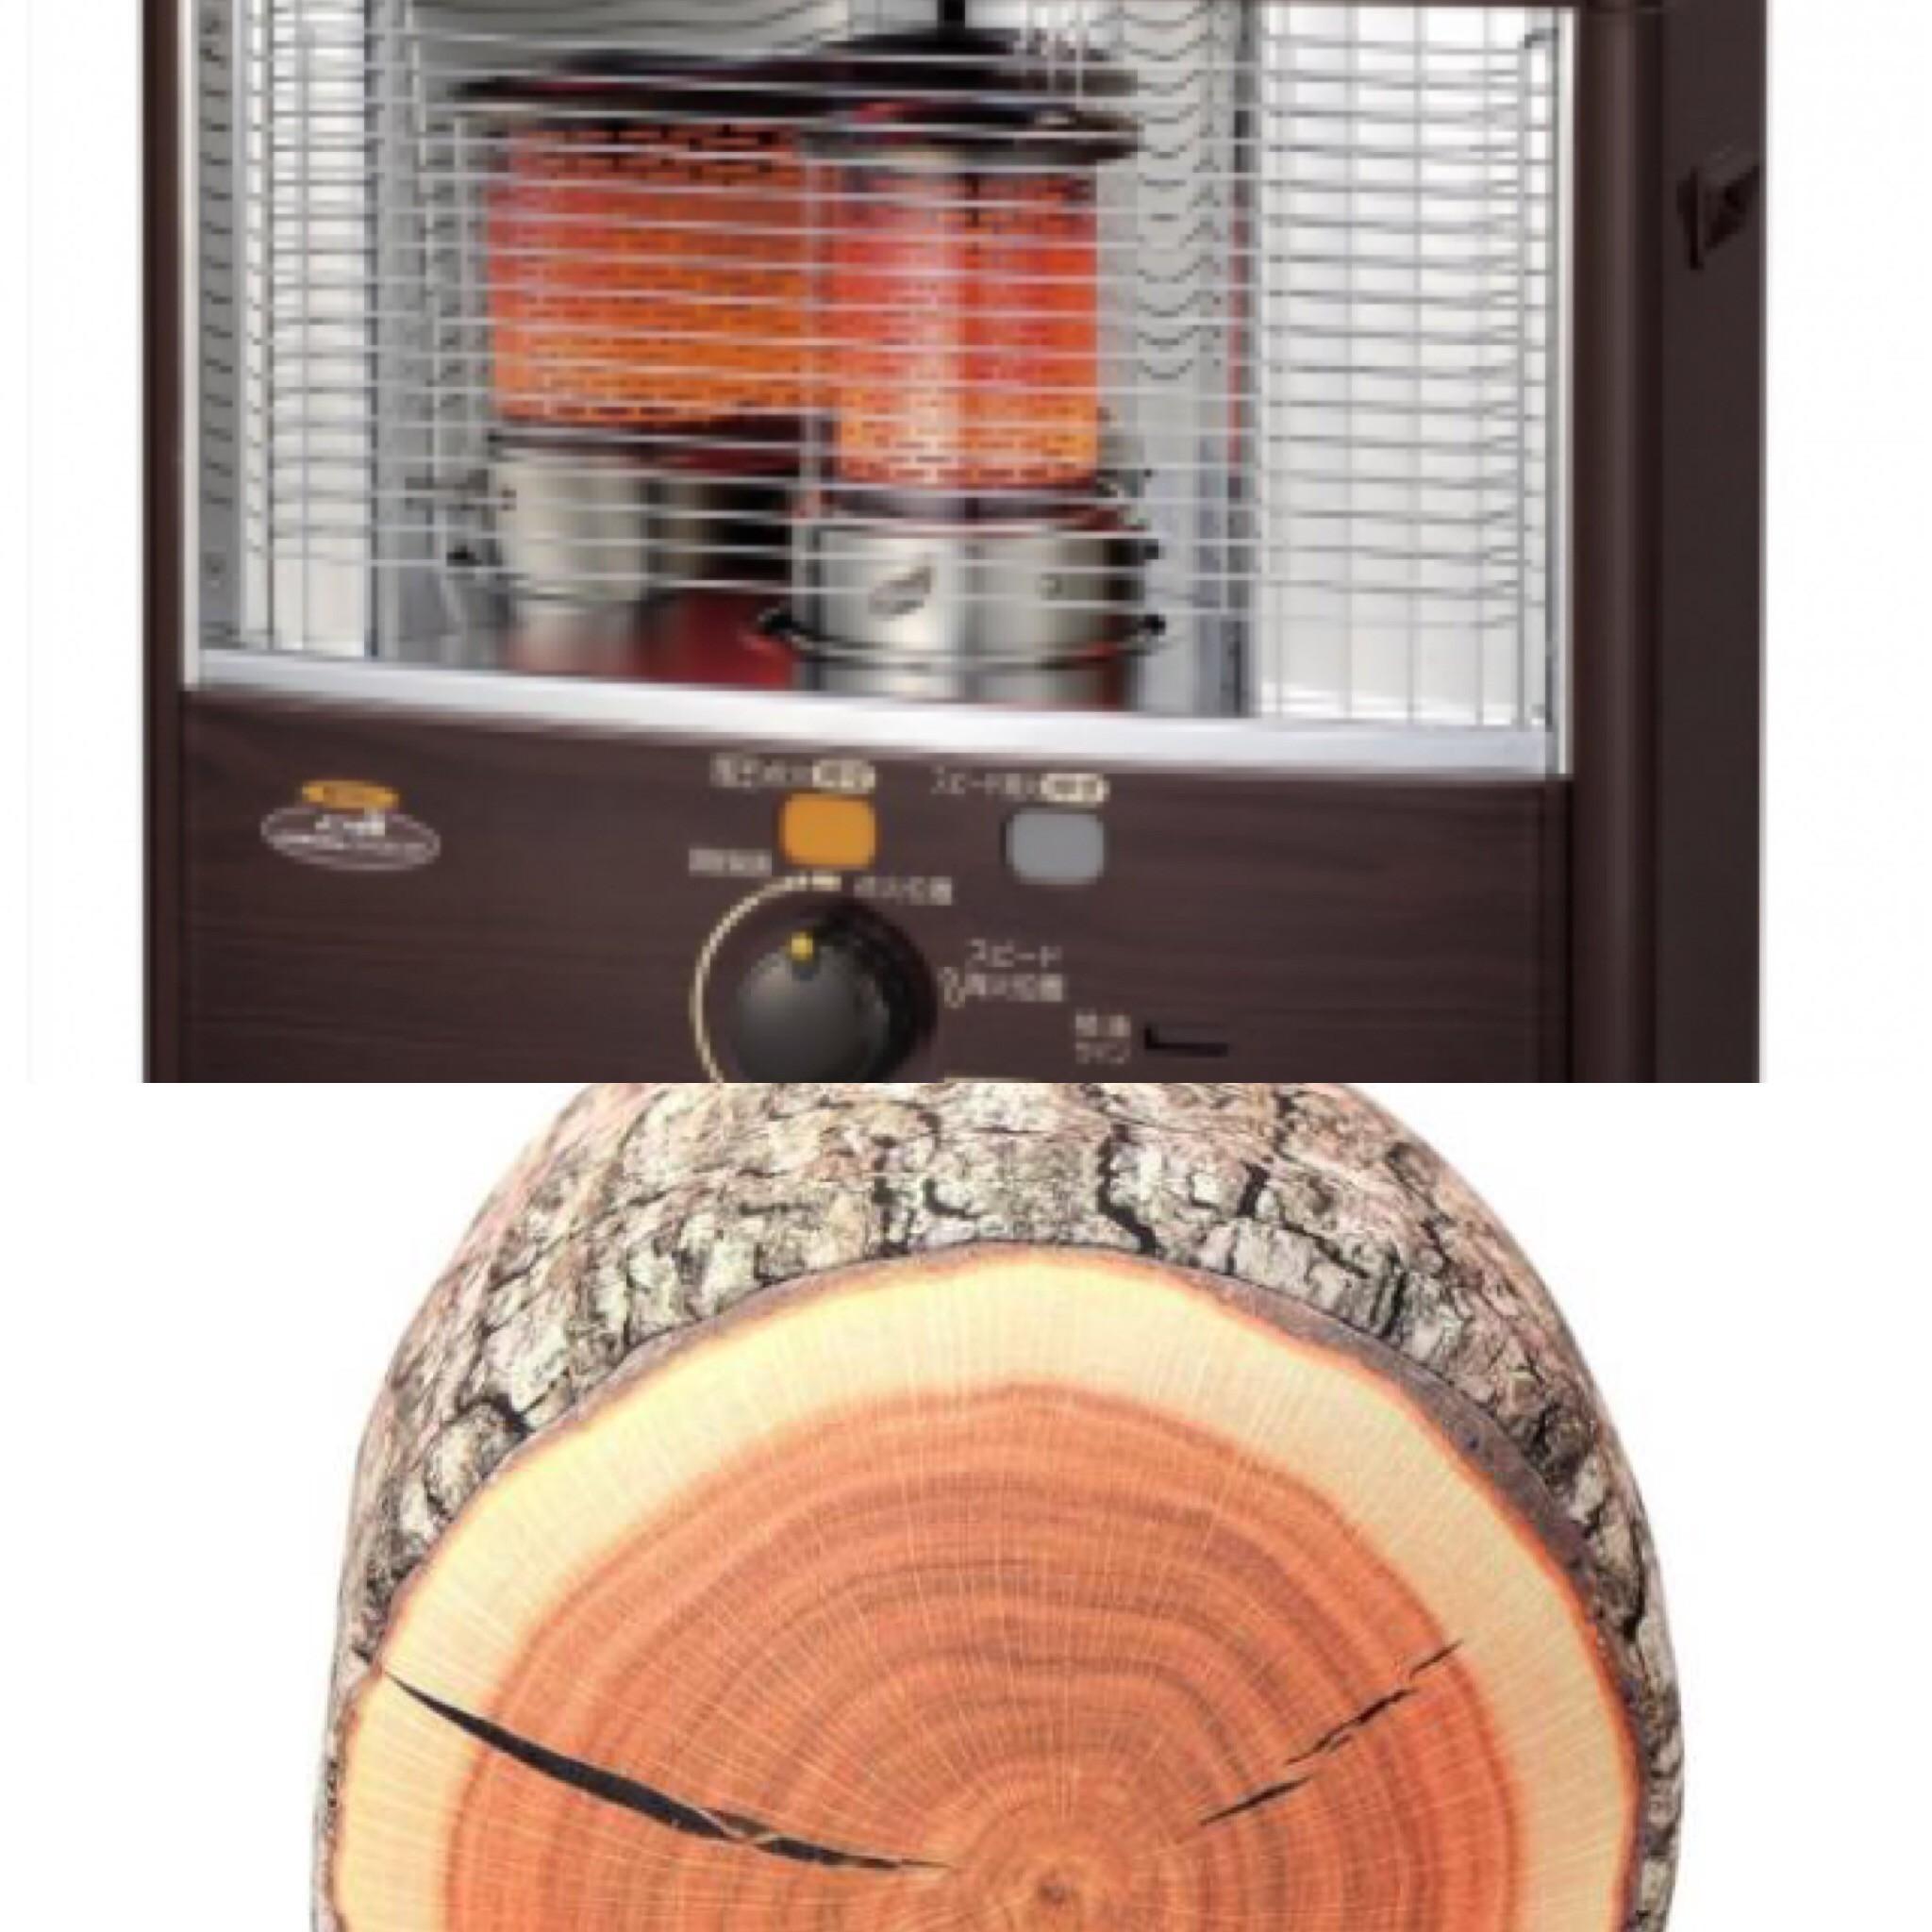 sugurustore-stove